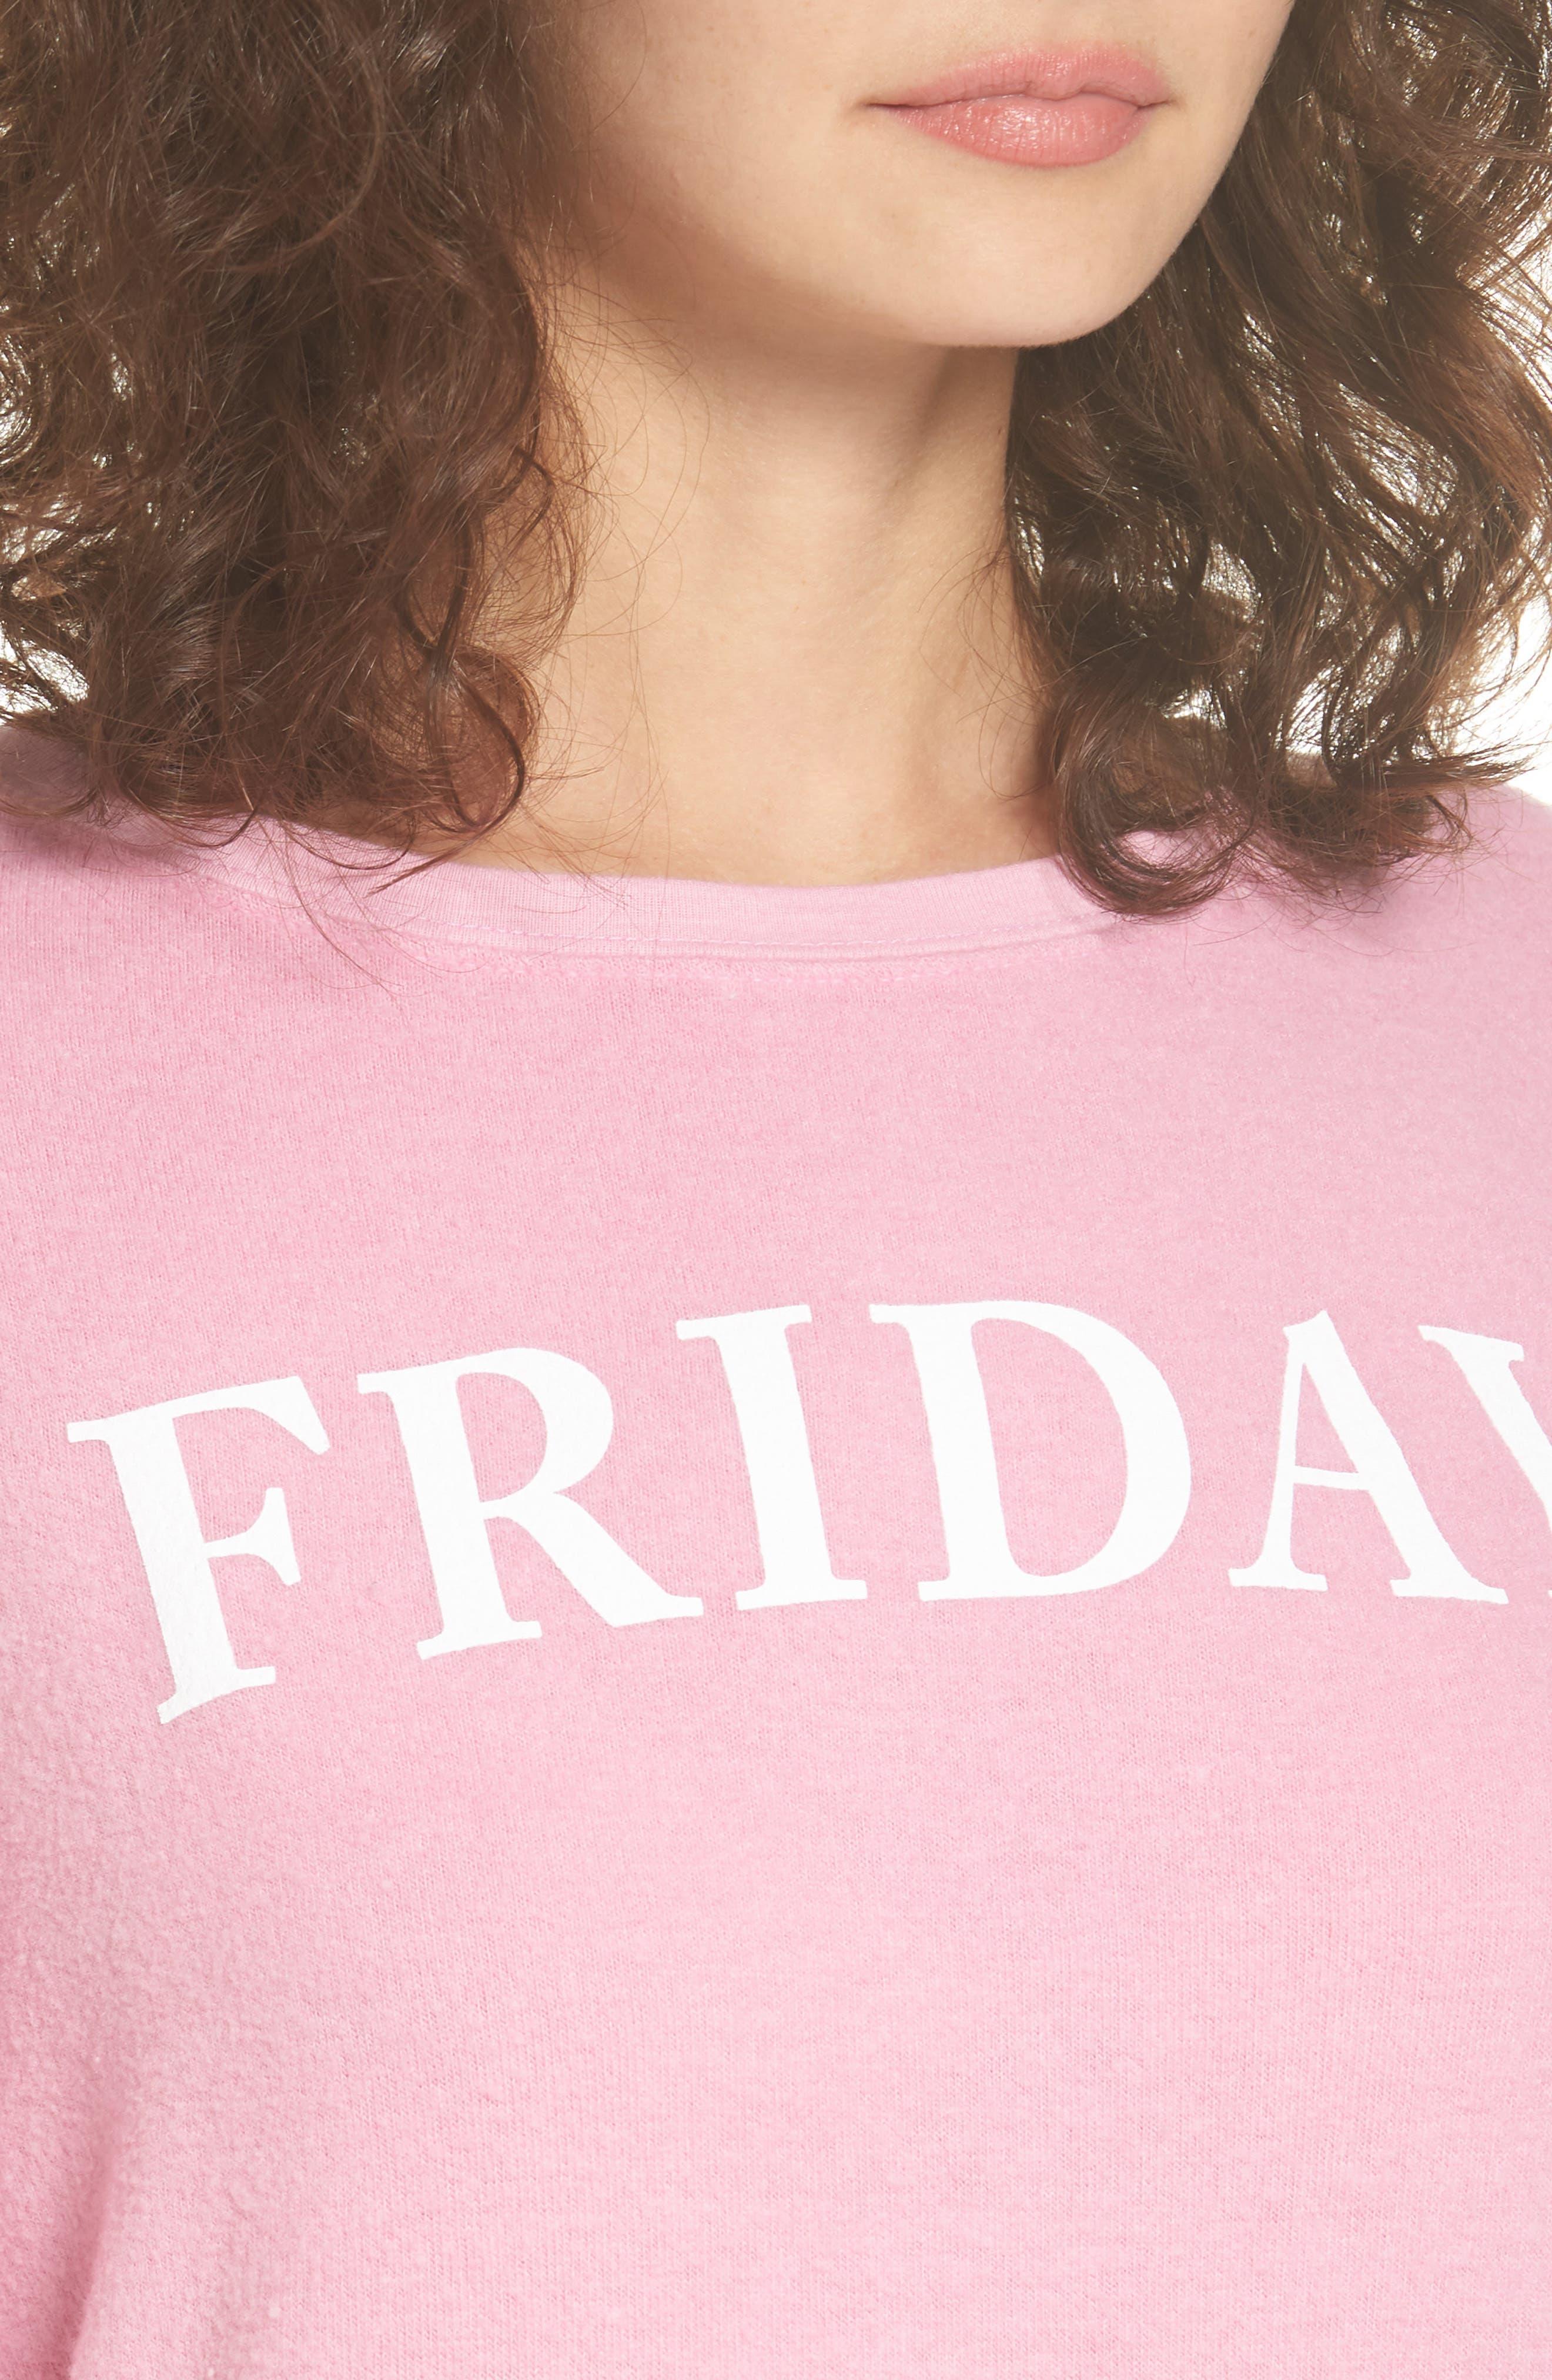 Friday Sweatshirt,                             Alternate thumbnail 4, color,                             Pink